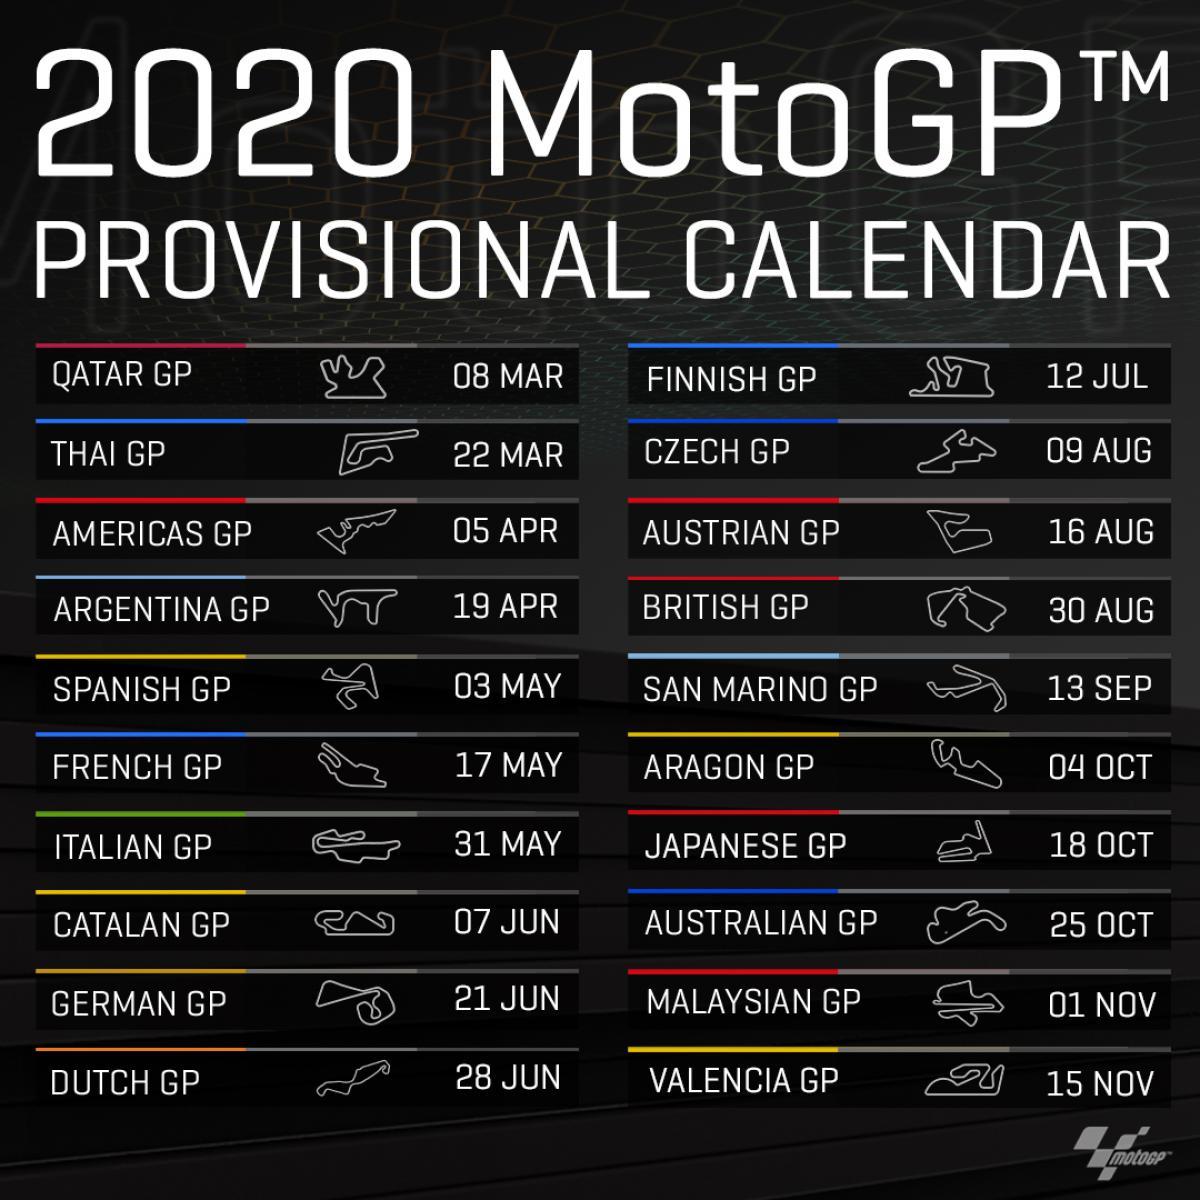 Provisional Calendar 2020 | Calcrutchlow35.nl with Calendar 2020 Nl